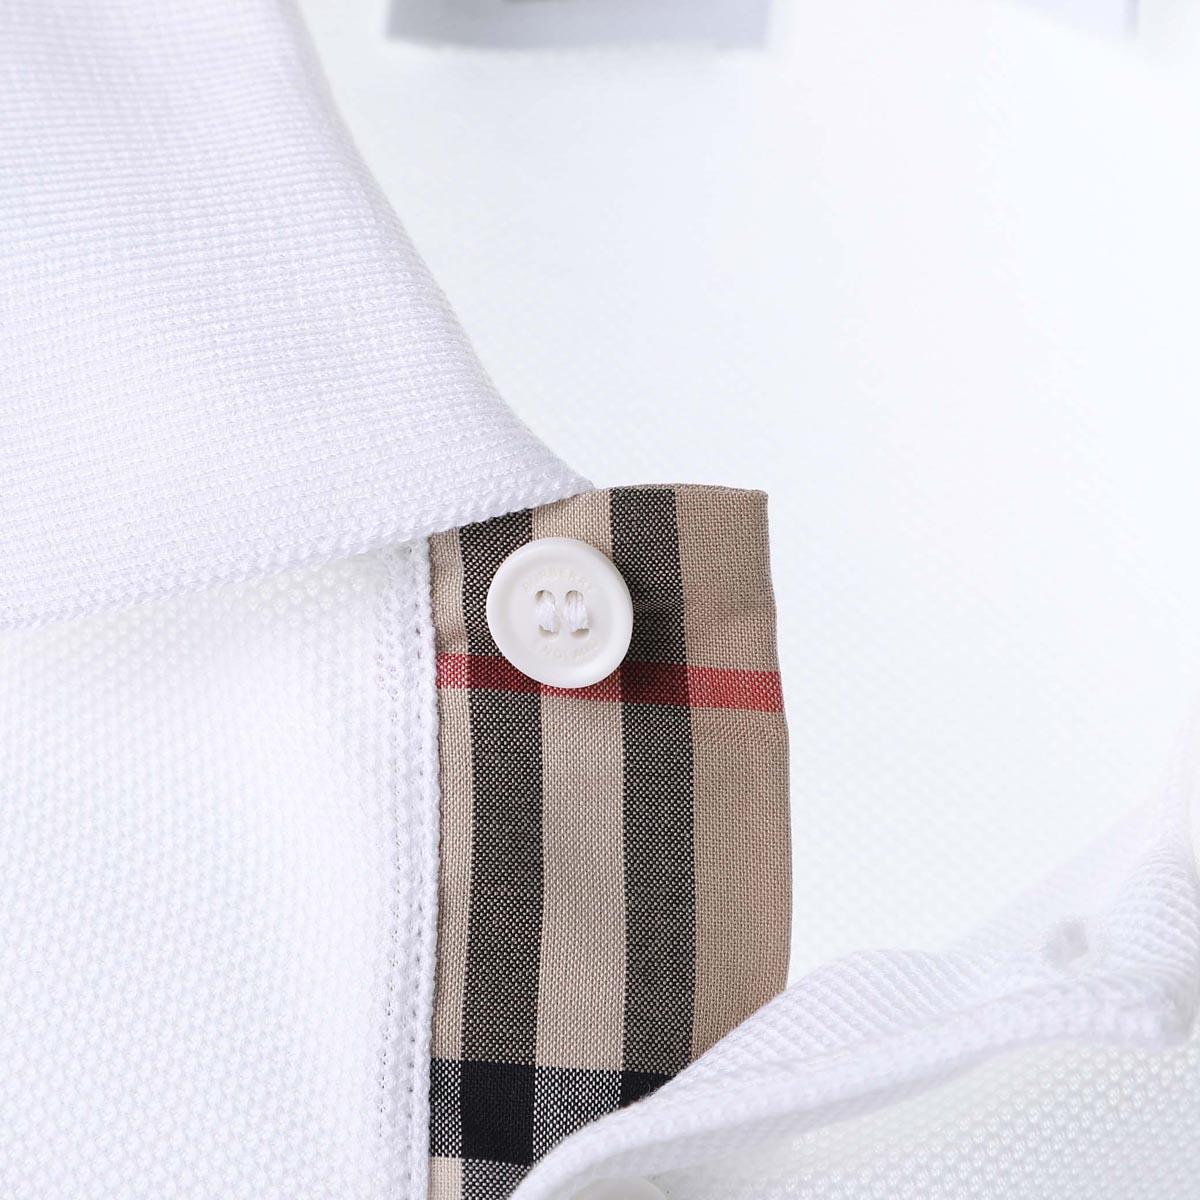 BURBERRY バーバリー ポロシャツ/EDDIE メンズ